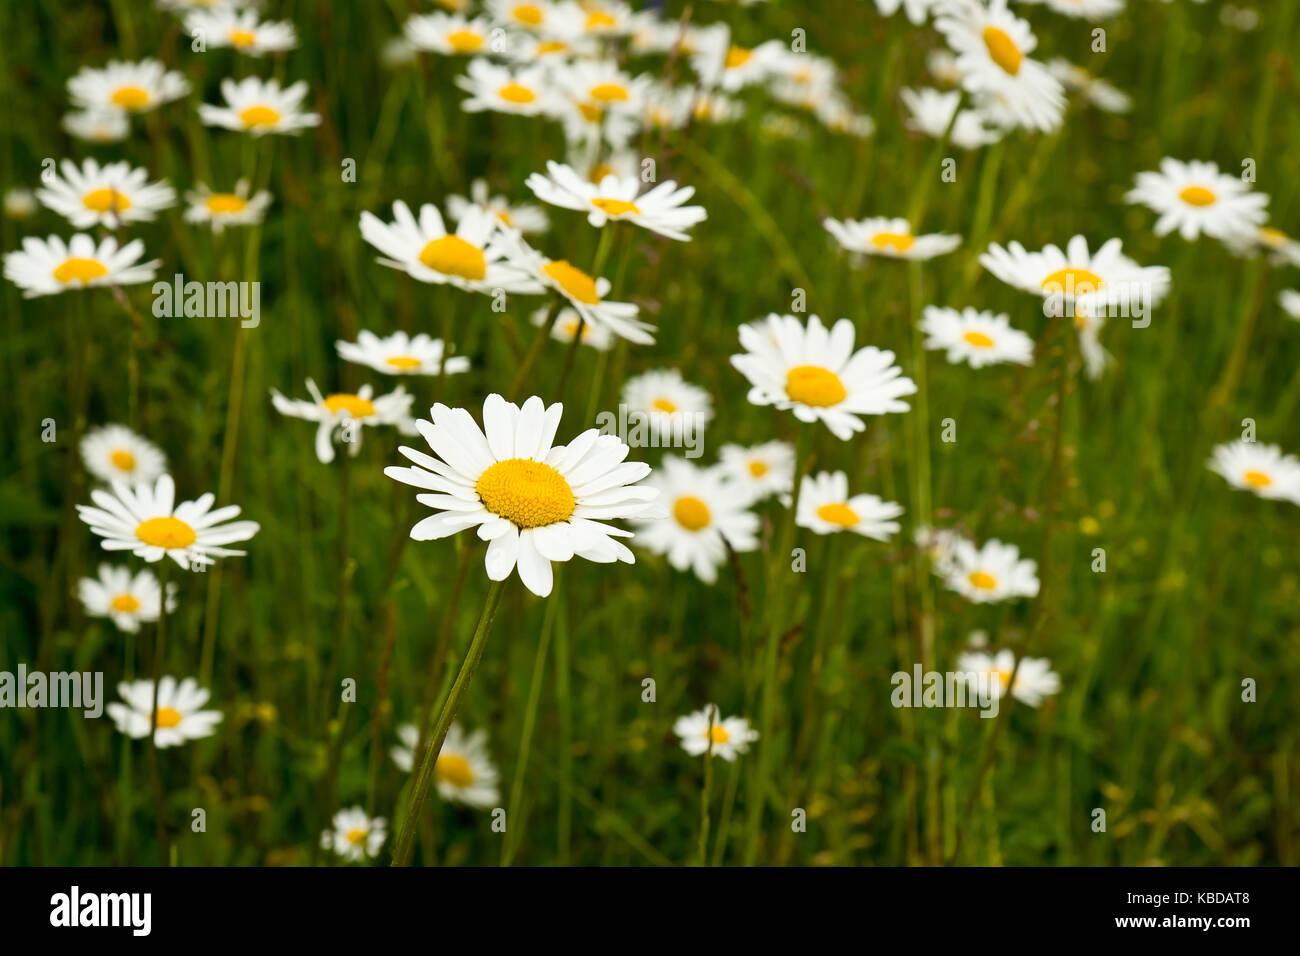 Midsummer Flowers Stock Photo 161948424 Alamy